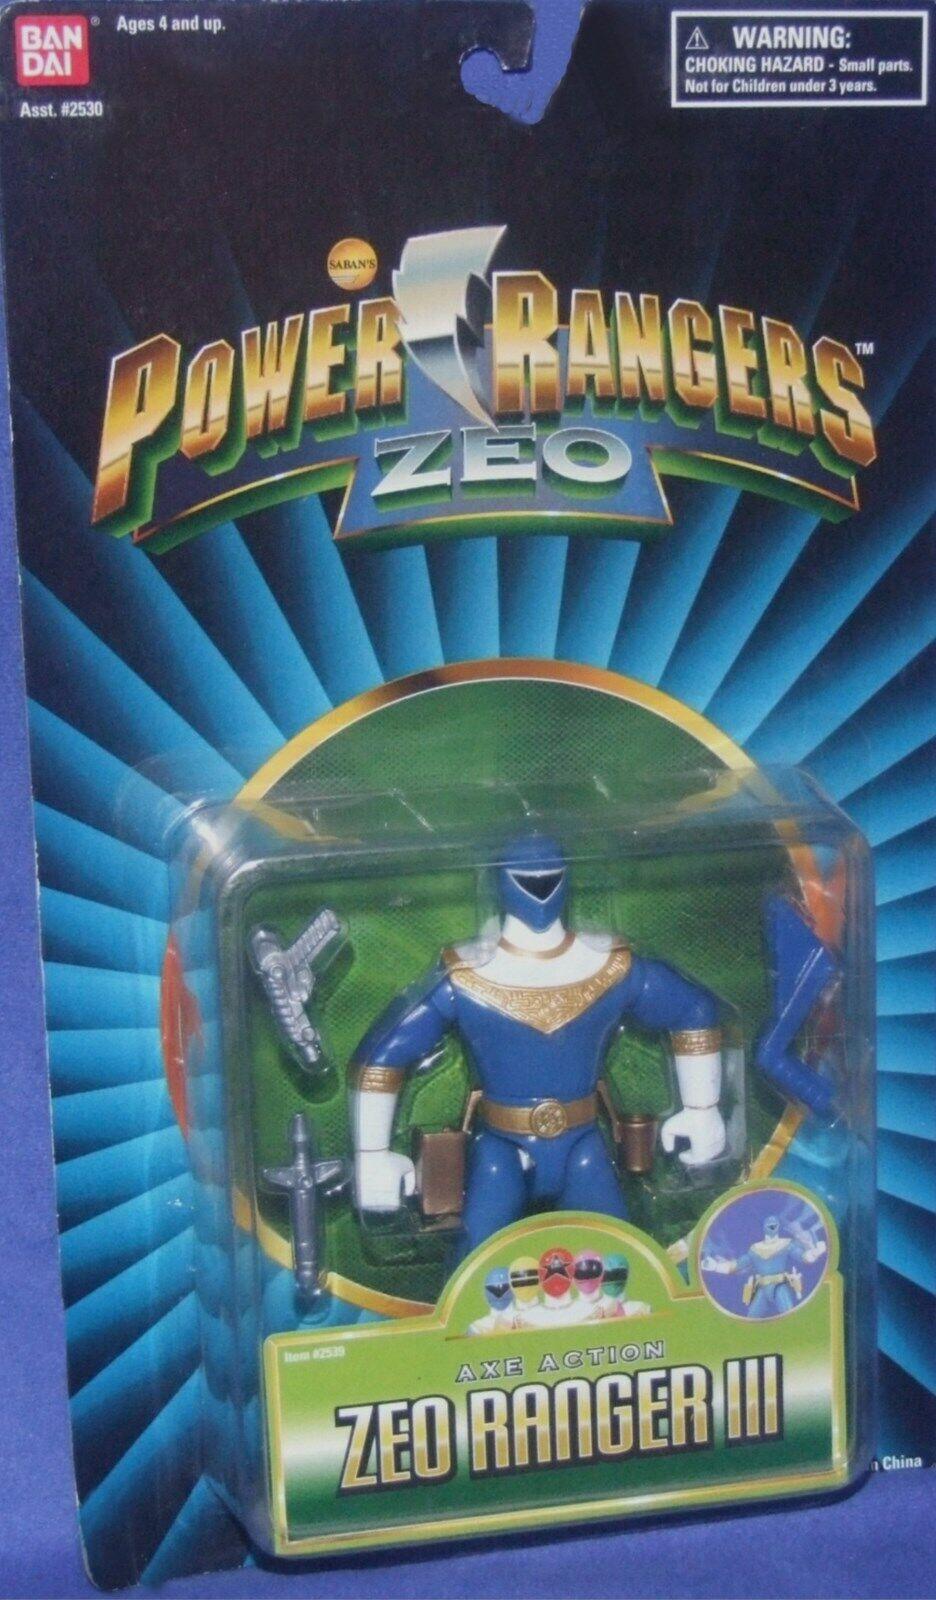 Energia Rangers ZEO 5  blu Zeo Ranger lll nuovo  Factory Sealed 1996 W Axe azione  qualità ufficiale